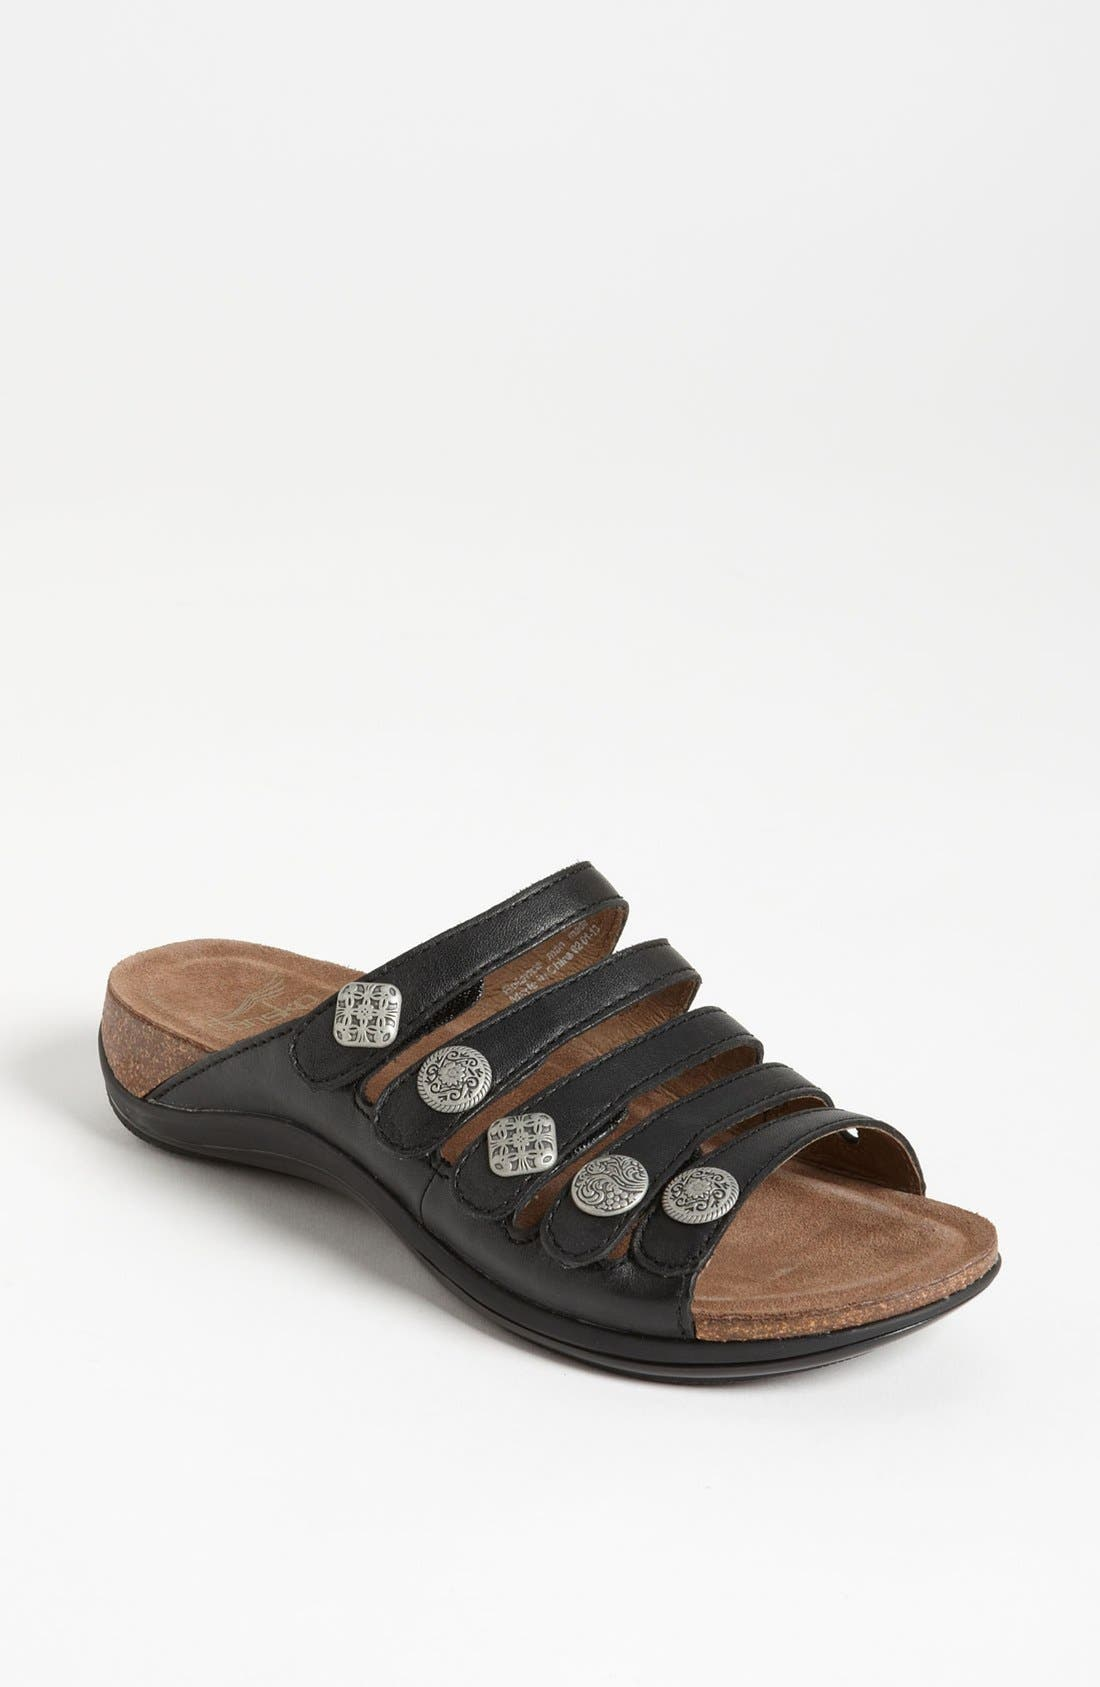 Alternate Image 1 Selected - Dansko 'Janie' Sandal